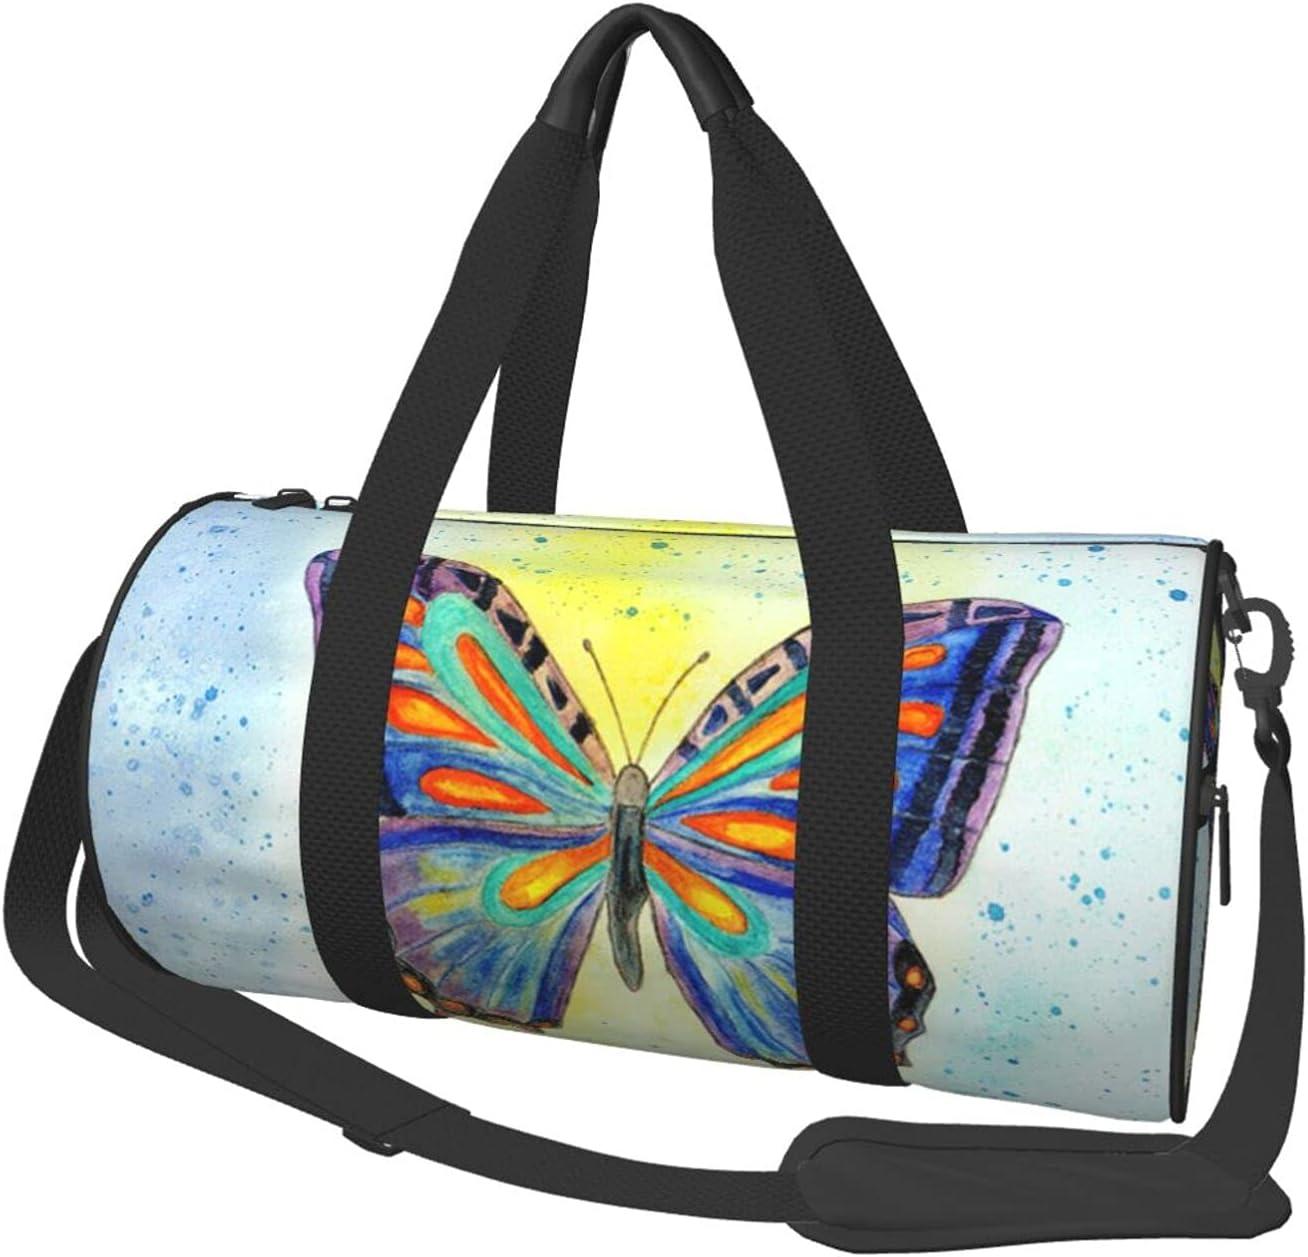 WSYC Super special Japan Maker New price Travel Bag Lightweight for Tote Gym Spor Workout